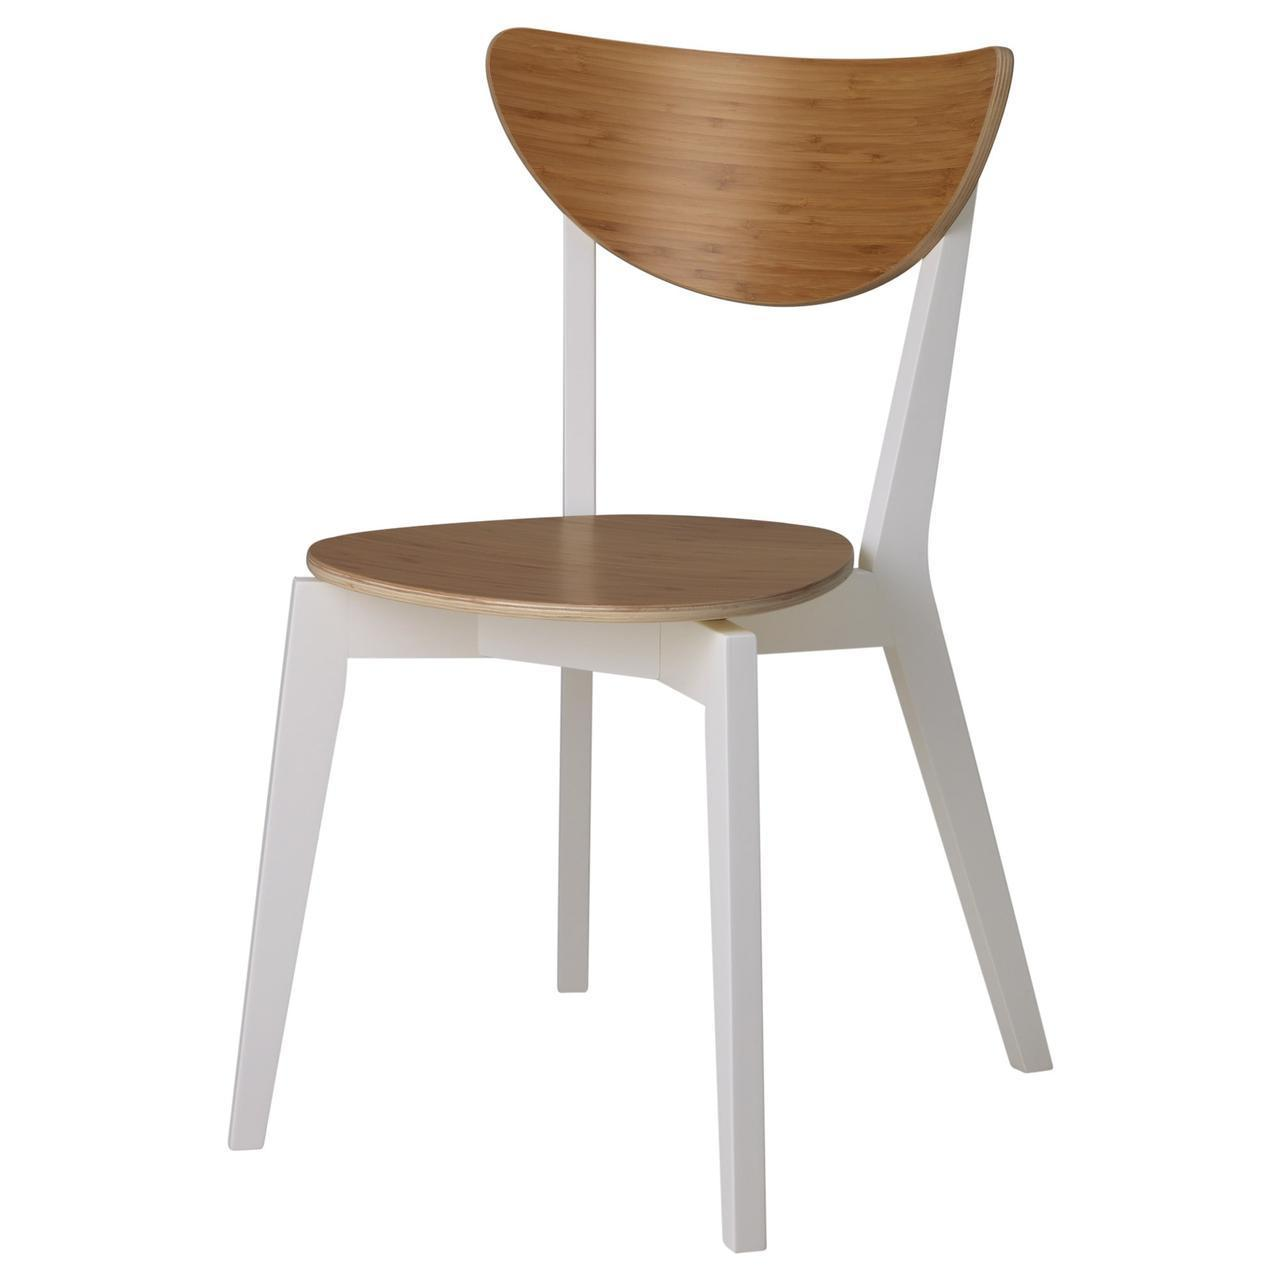 Кресло кухонное IKEA NORDMYRA бамбук 803.732.27